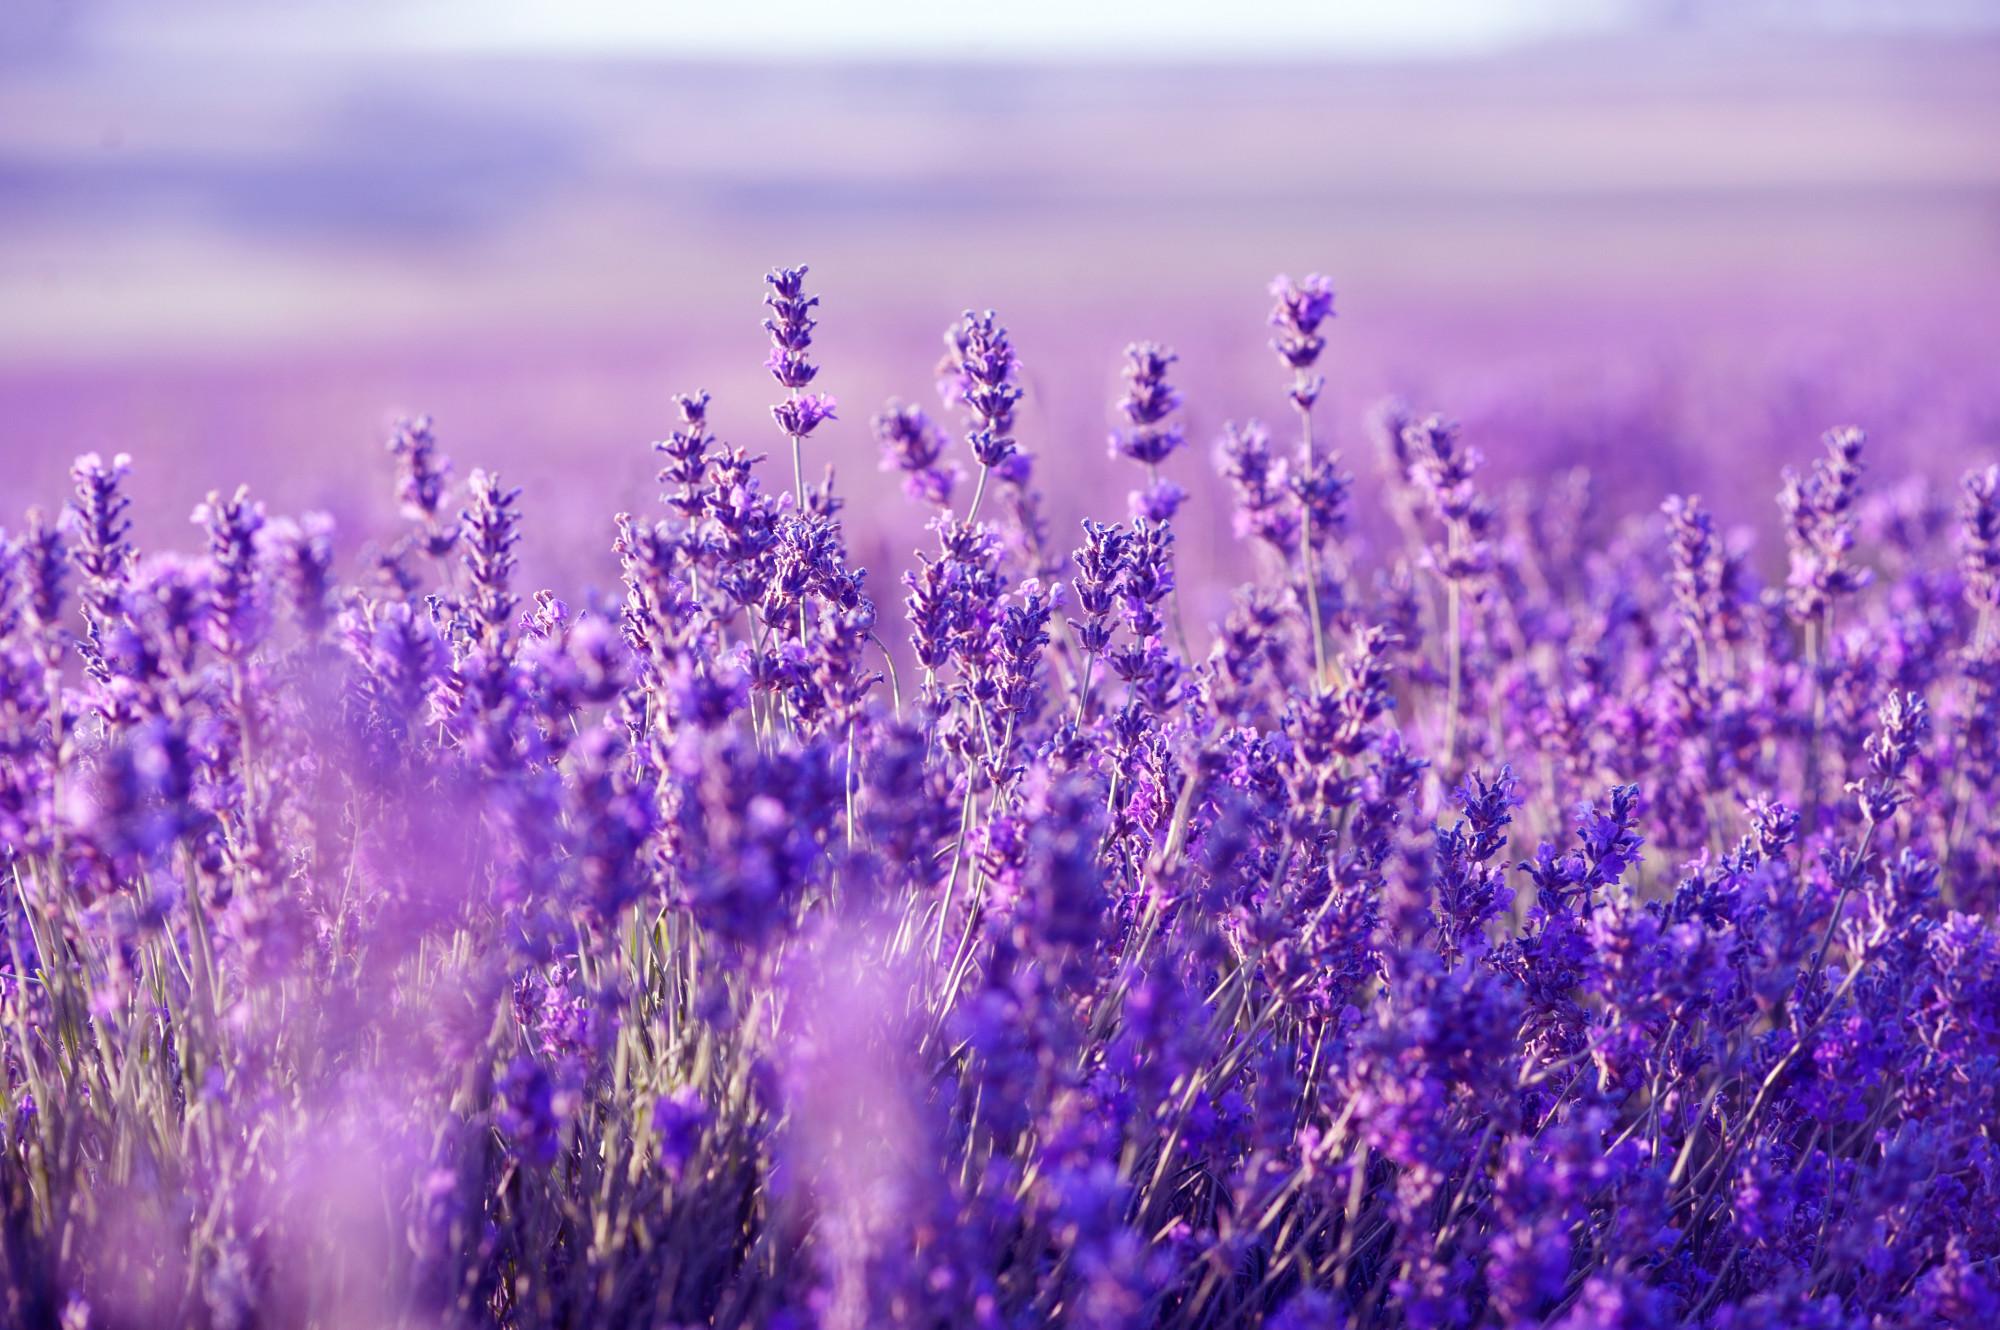 Lavender Flower Wallpapers Hd Pixelstalk Lavender Flower Wallpaper 2000x1330